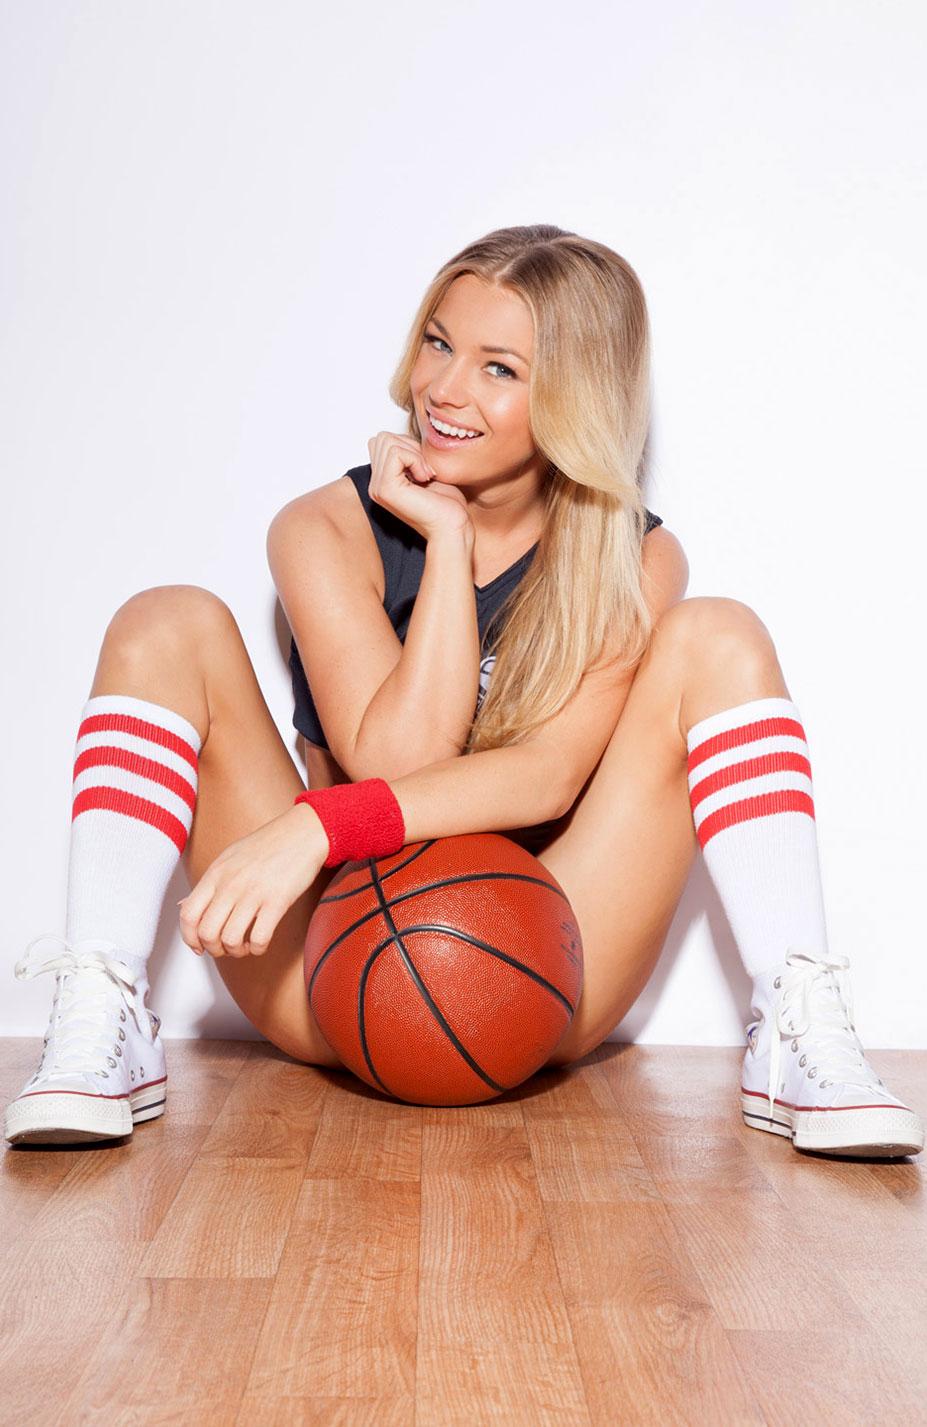 Никки Ли играет в баскетбол в форме команды Gonzaga Bulldogs / Nikki Leigh - College Basketball